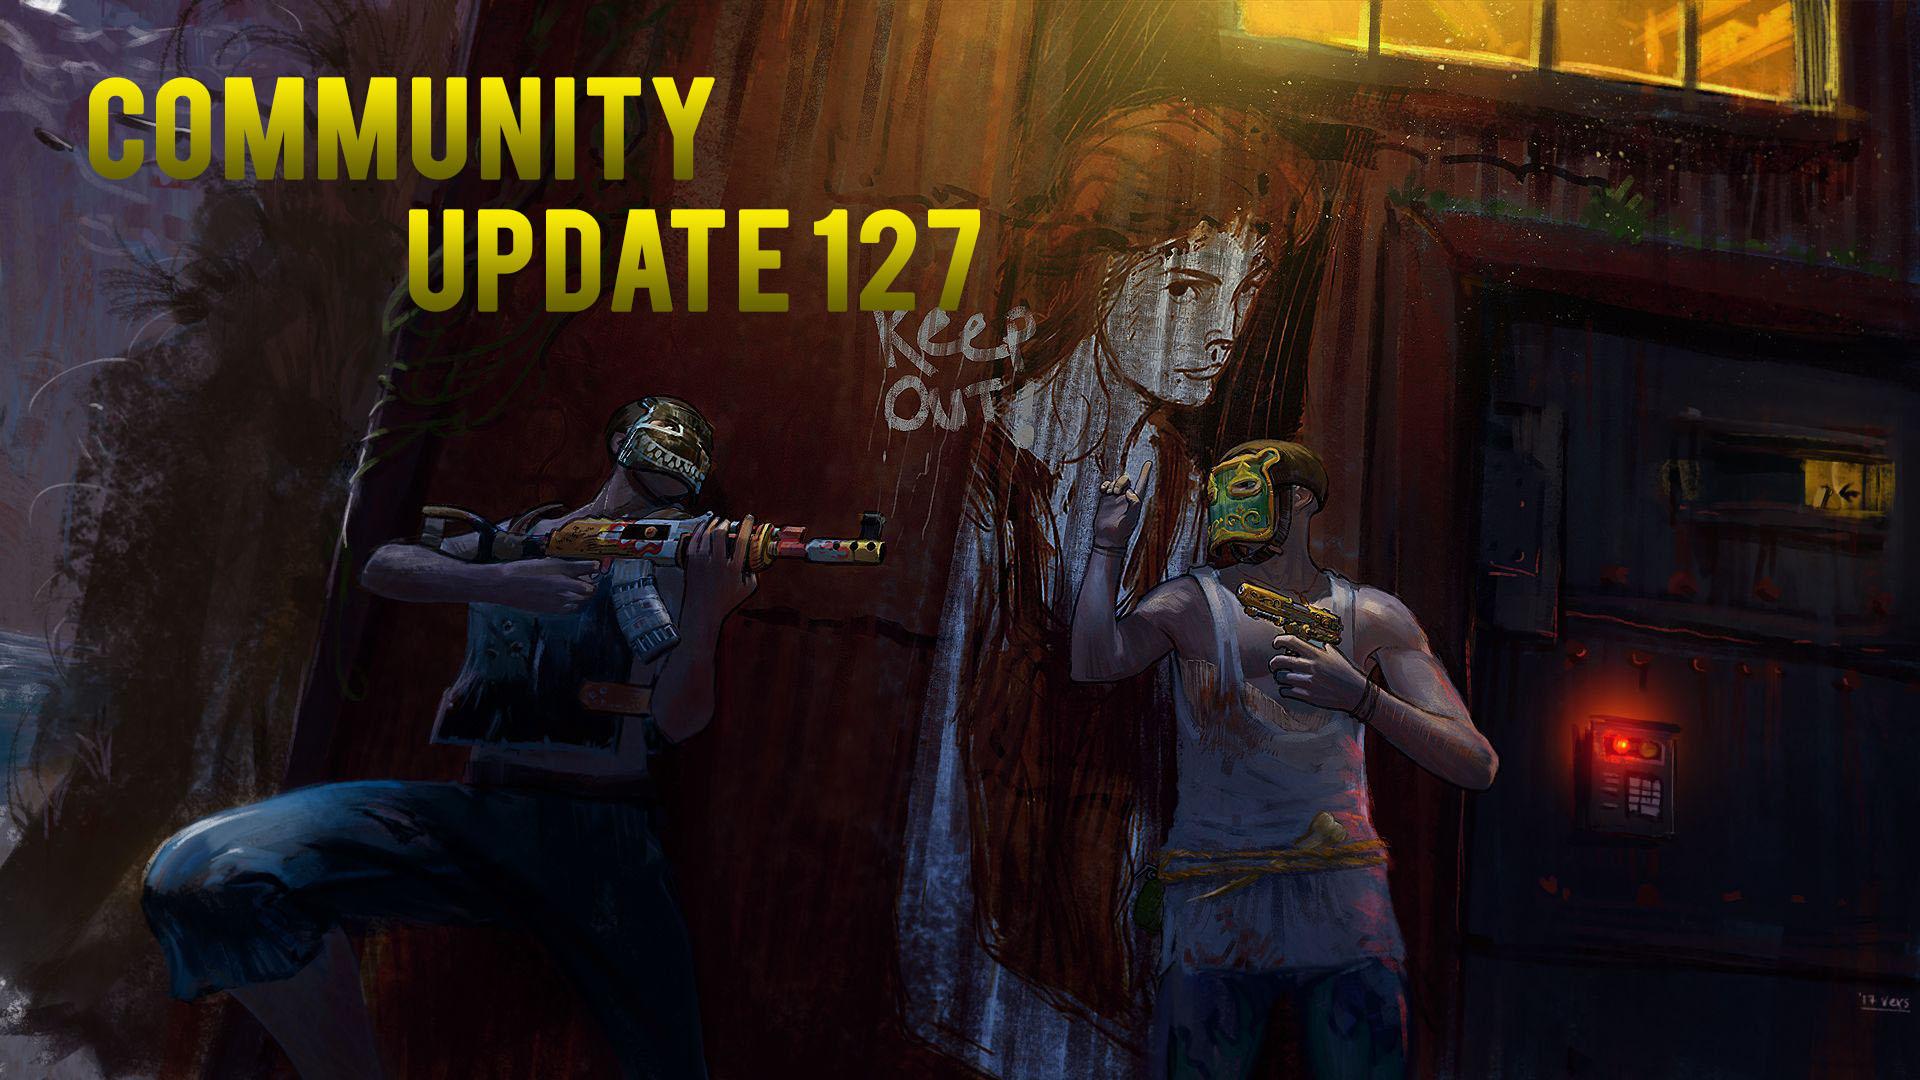 Community Update 127